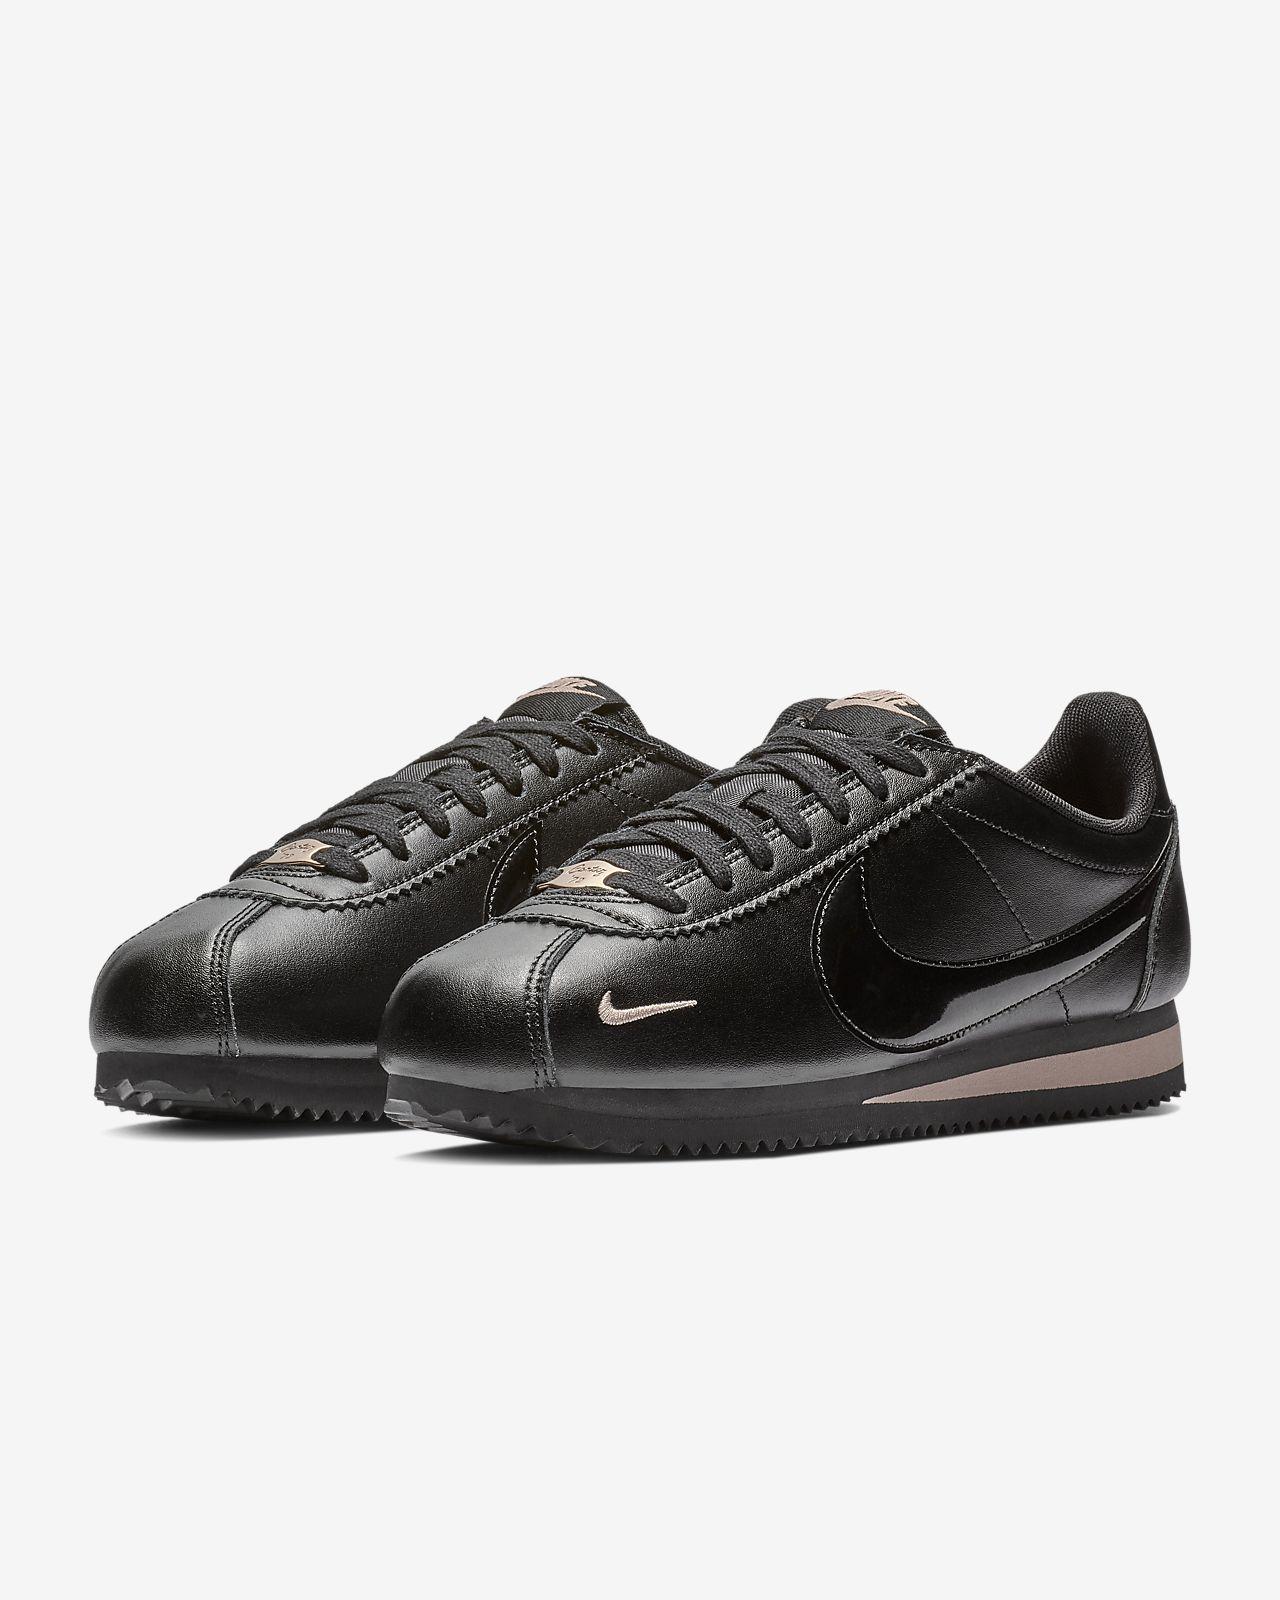 6f9c8db051d Nike Classic Cortez Premium Women s Shoe. Nike.com IE